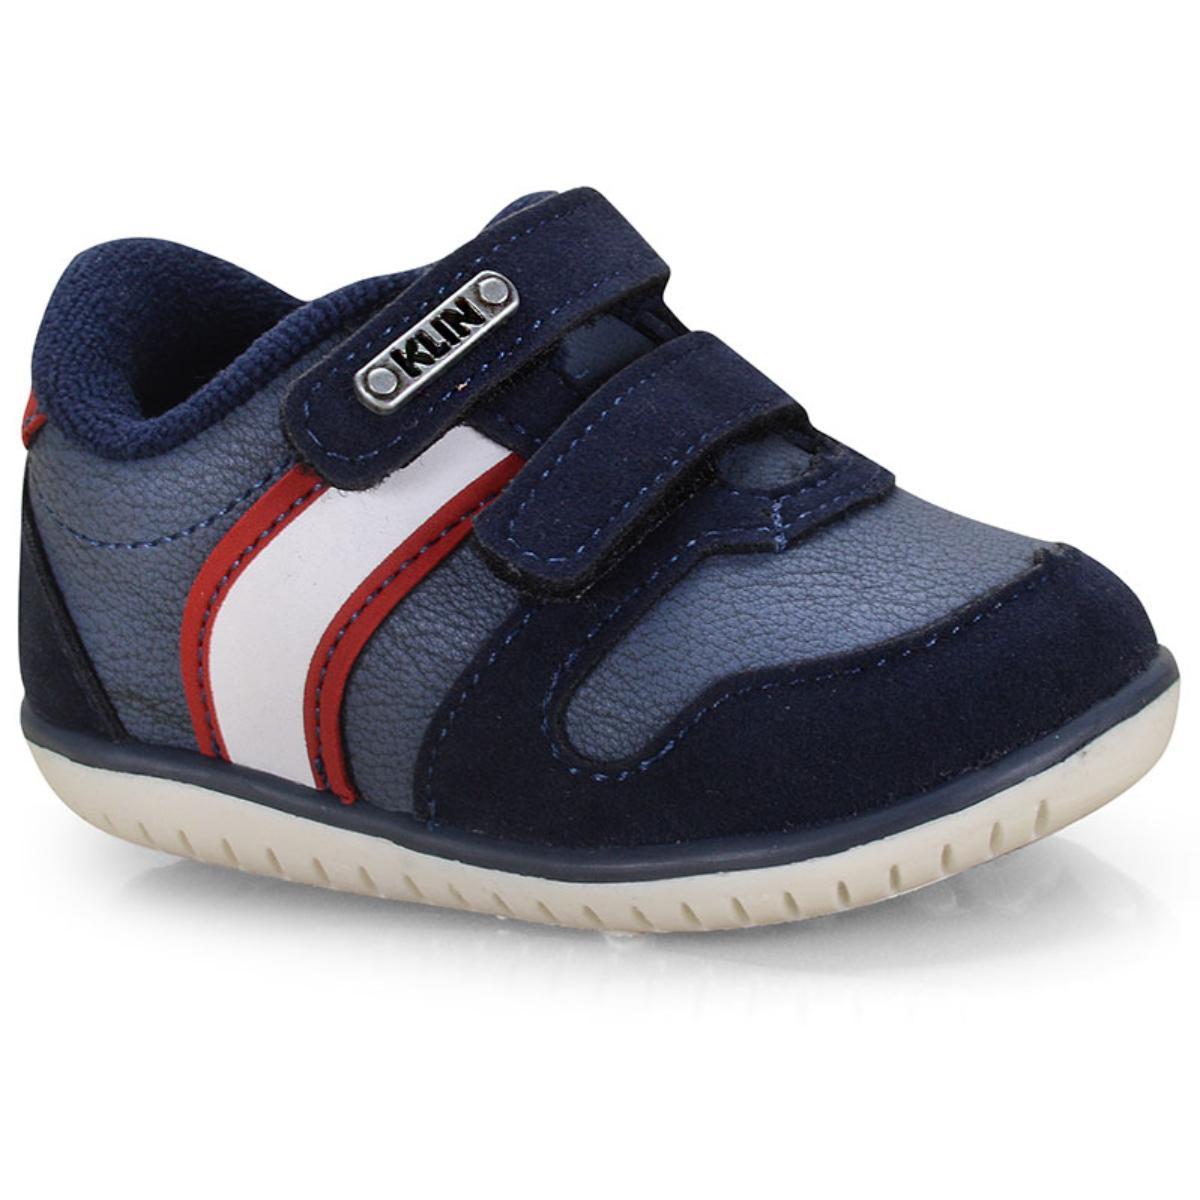 Tênis Masc Infantil Klin 166.111 Jeans/marinho/vermelho